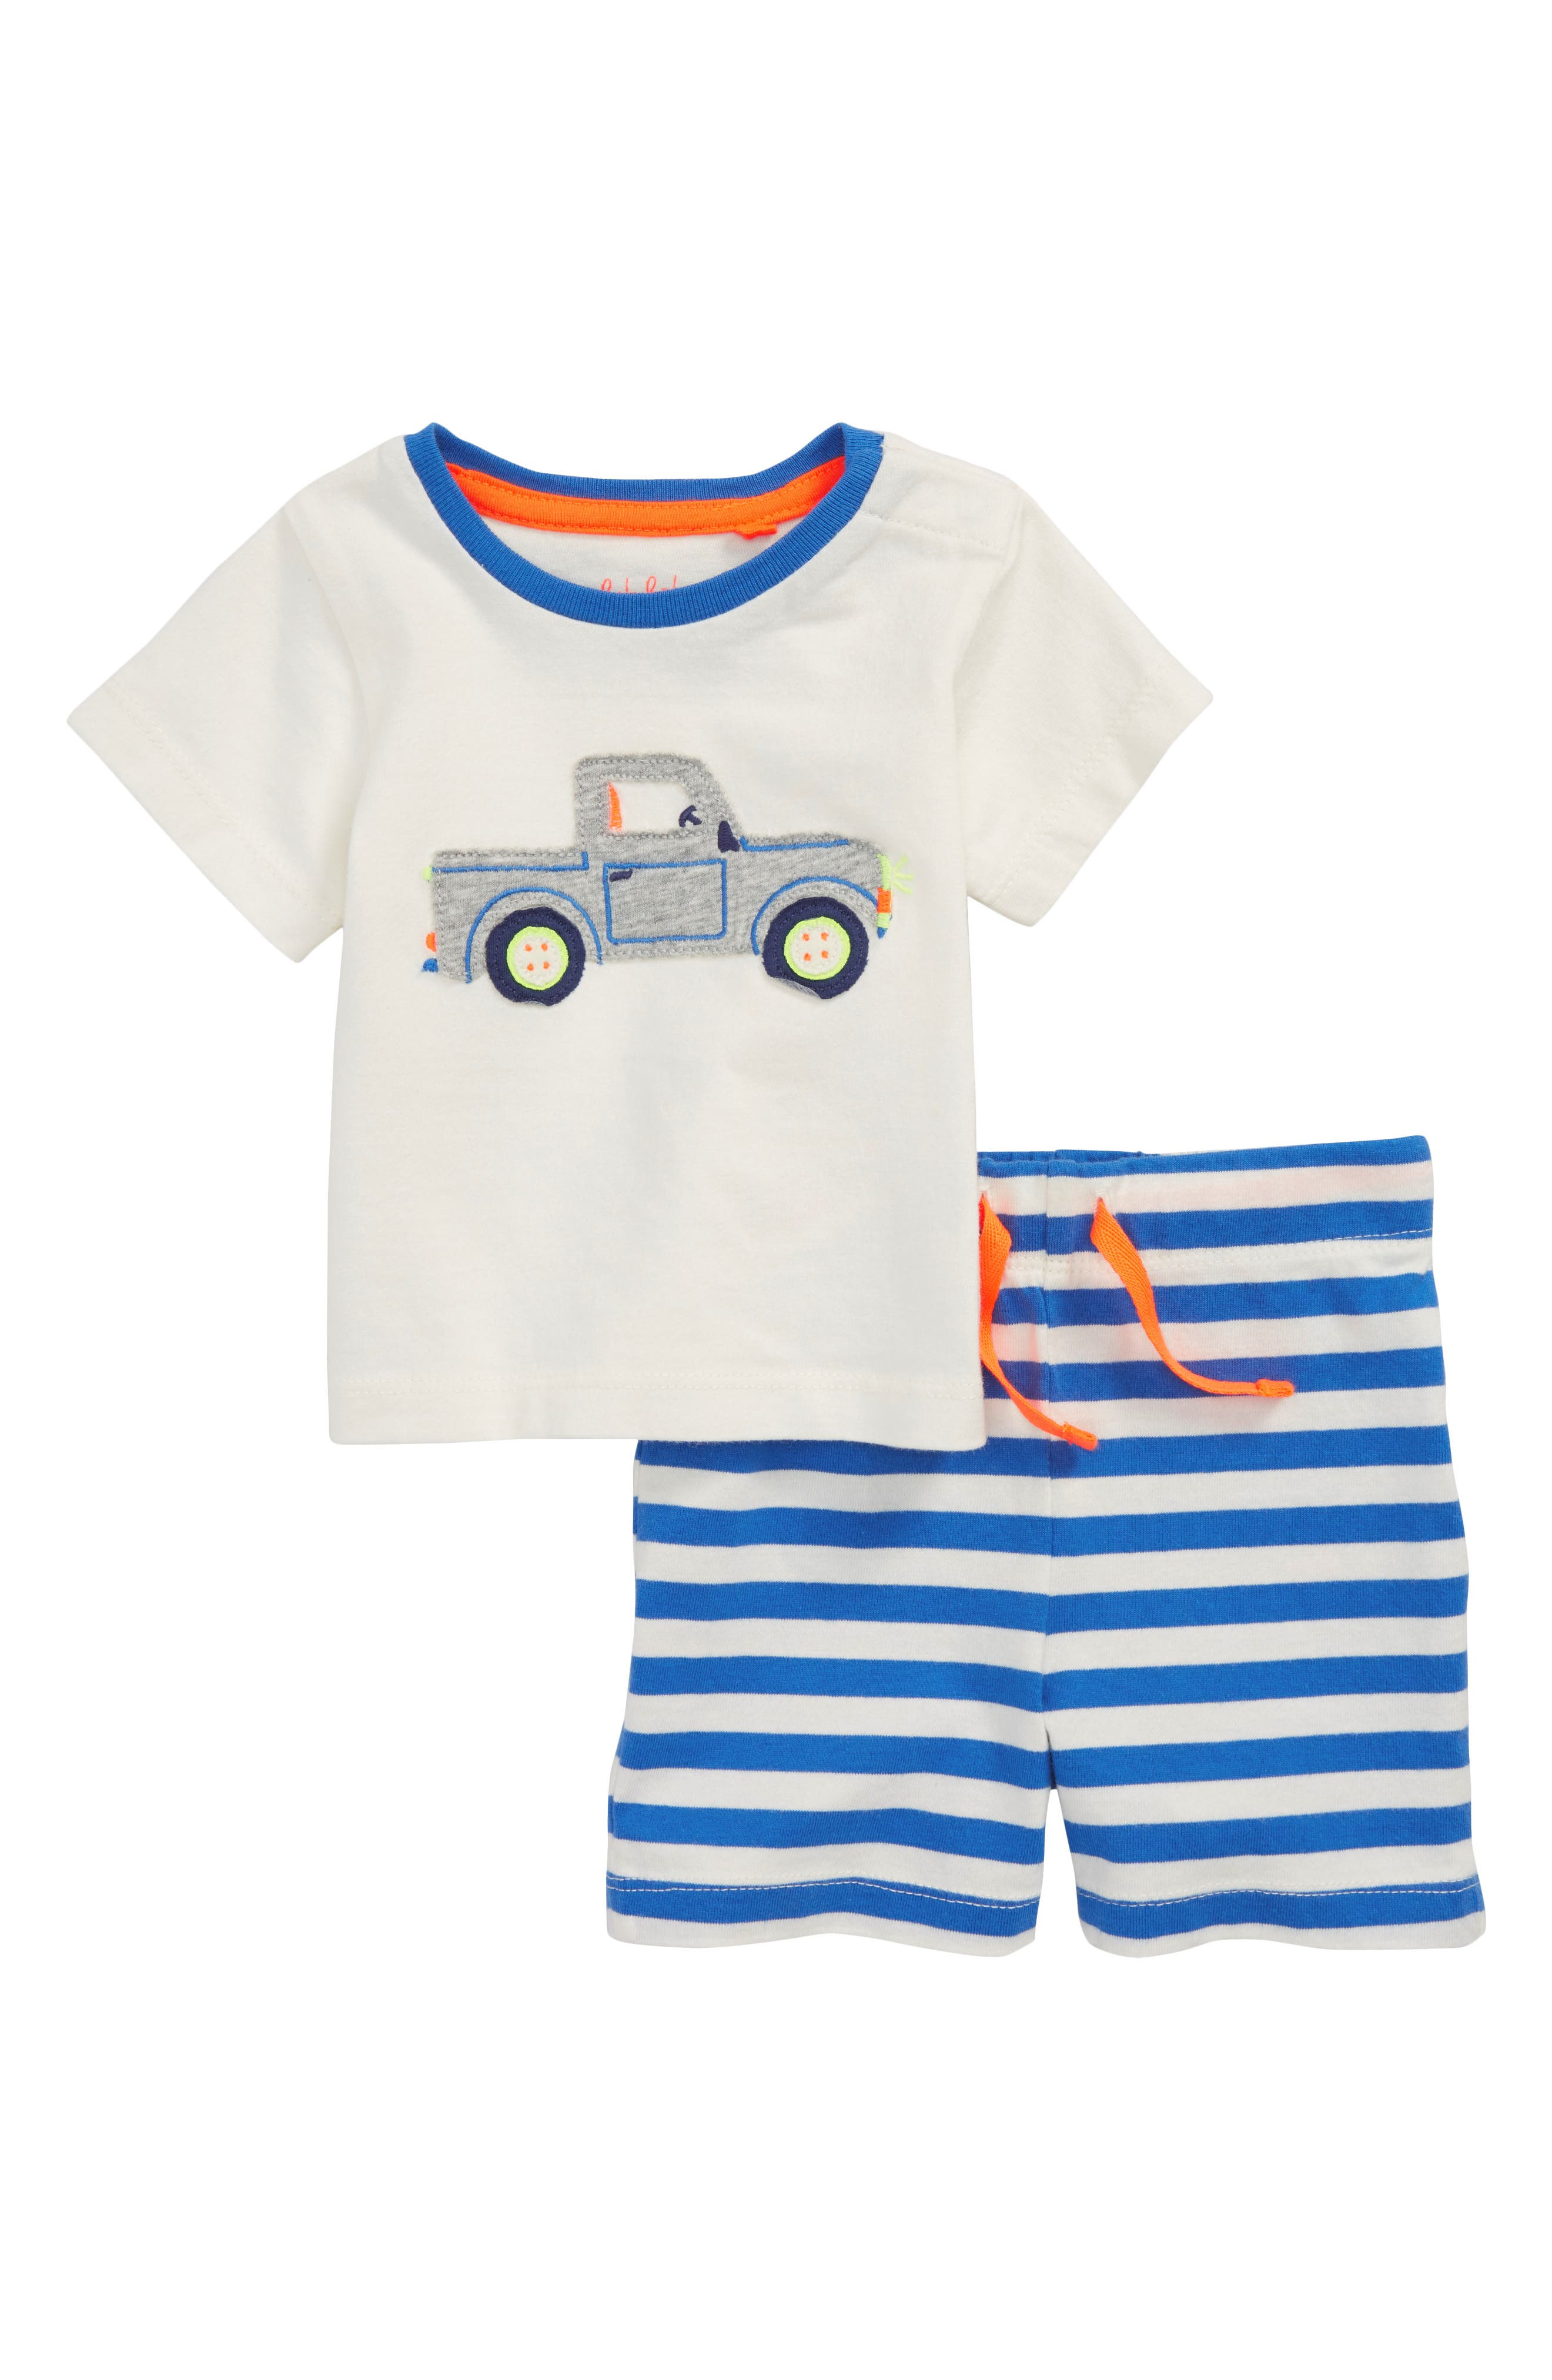 Fun Truck Appliqué T-Shirt & Shorts Set,                         Main,                         color, Ivory Truck